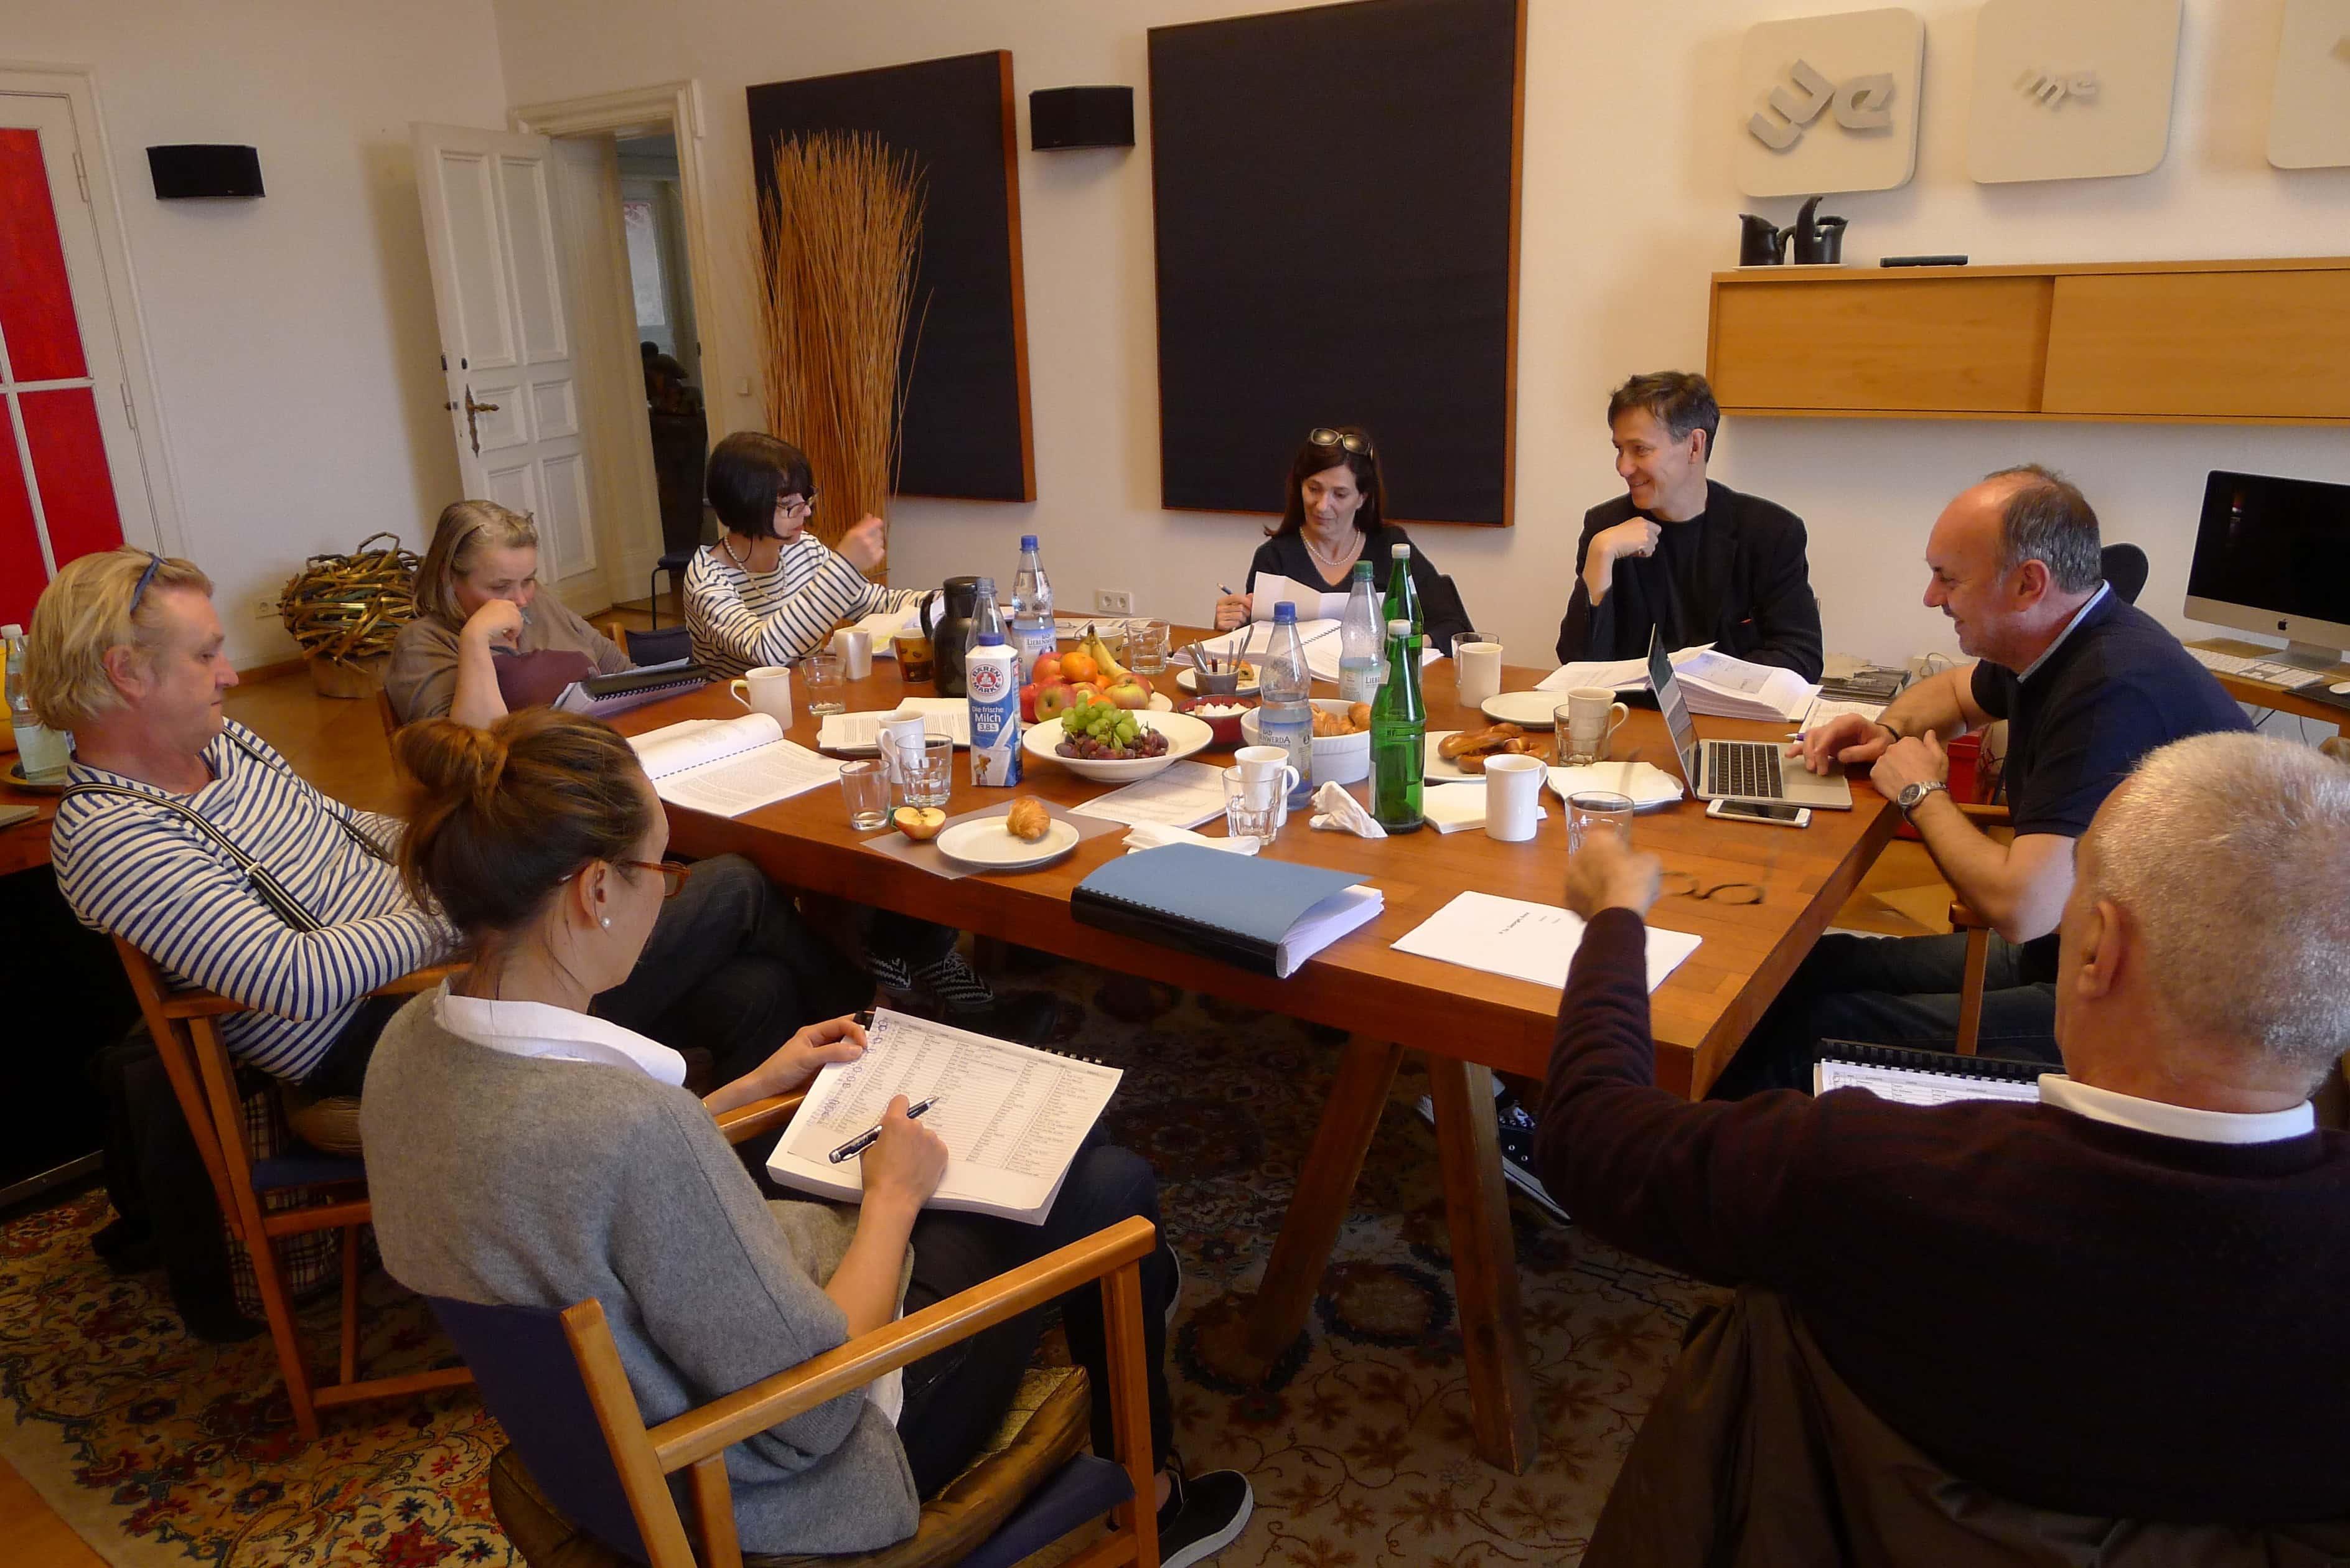 Berlin Film Residencies – NIPKOW PROGRAMM Jury Session 2018, Od Howell, Detlev Buck, Wenka von Mikulicz, Petra Weisenburger, Christine Camdessus, Stefan Laudyn, Danijel Hocevar and Cedomir Kolar